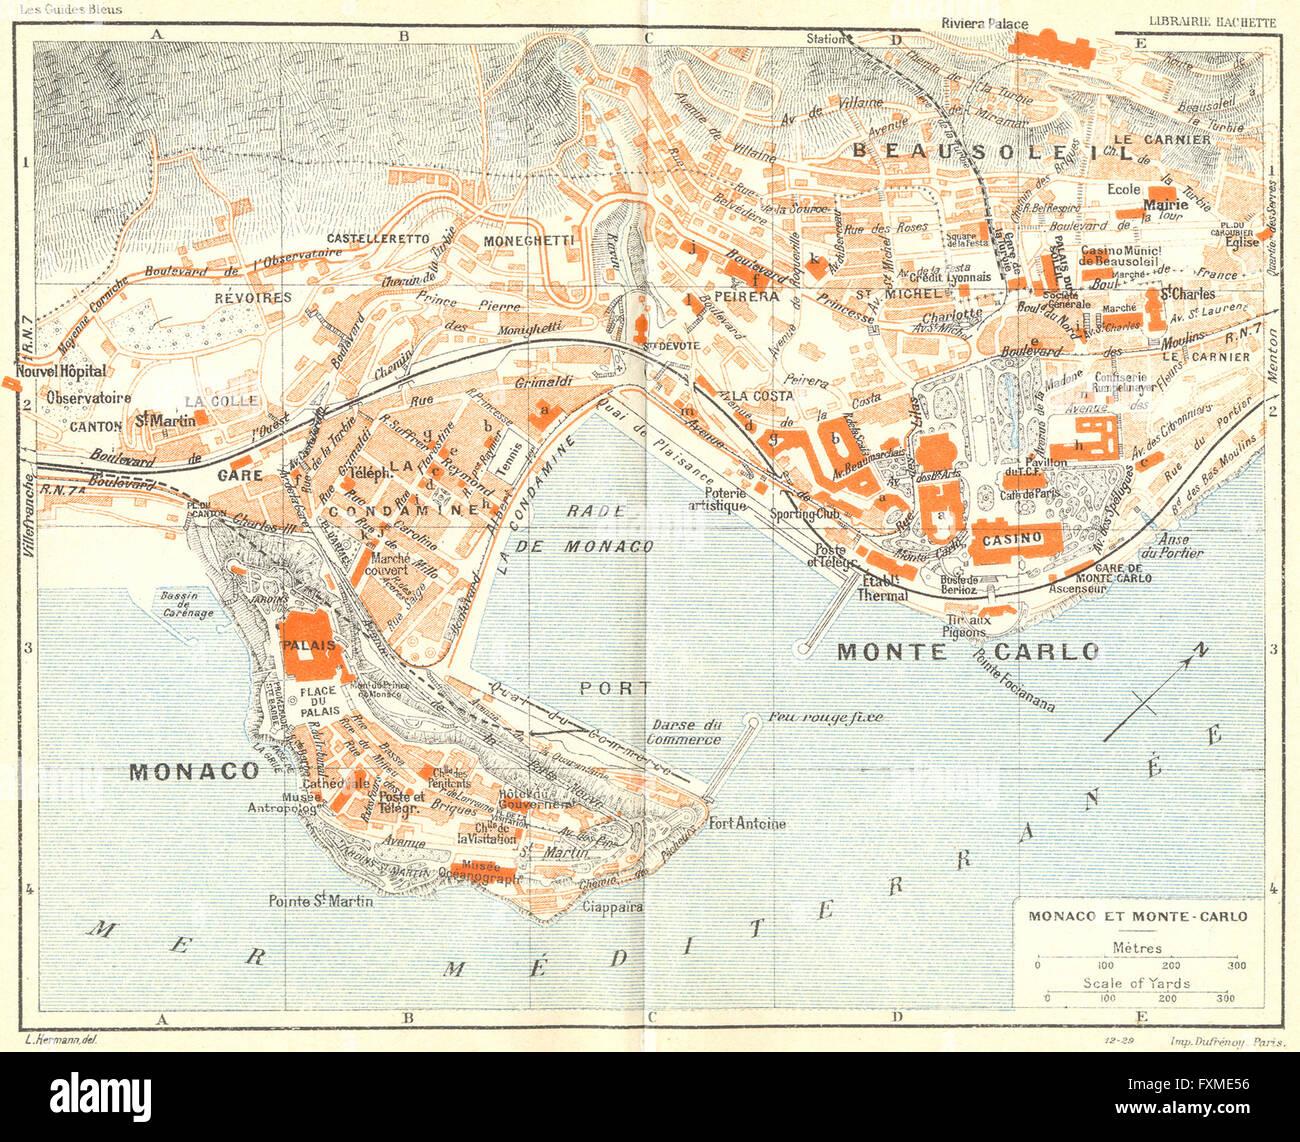 Monte Carlo World Map.Cote D Azur Monaco Et Monte Carlo 1926 Vintage Map Stock Photo